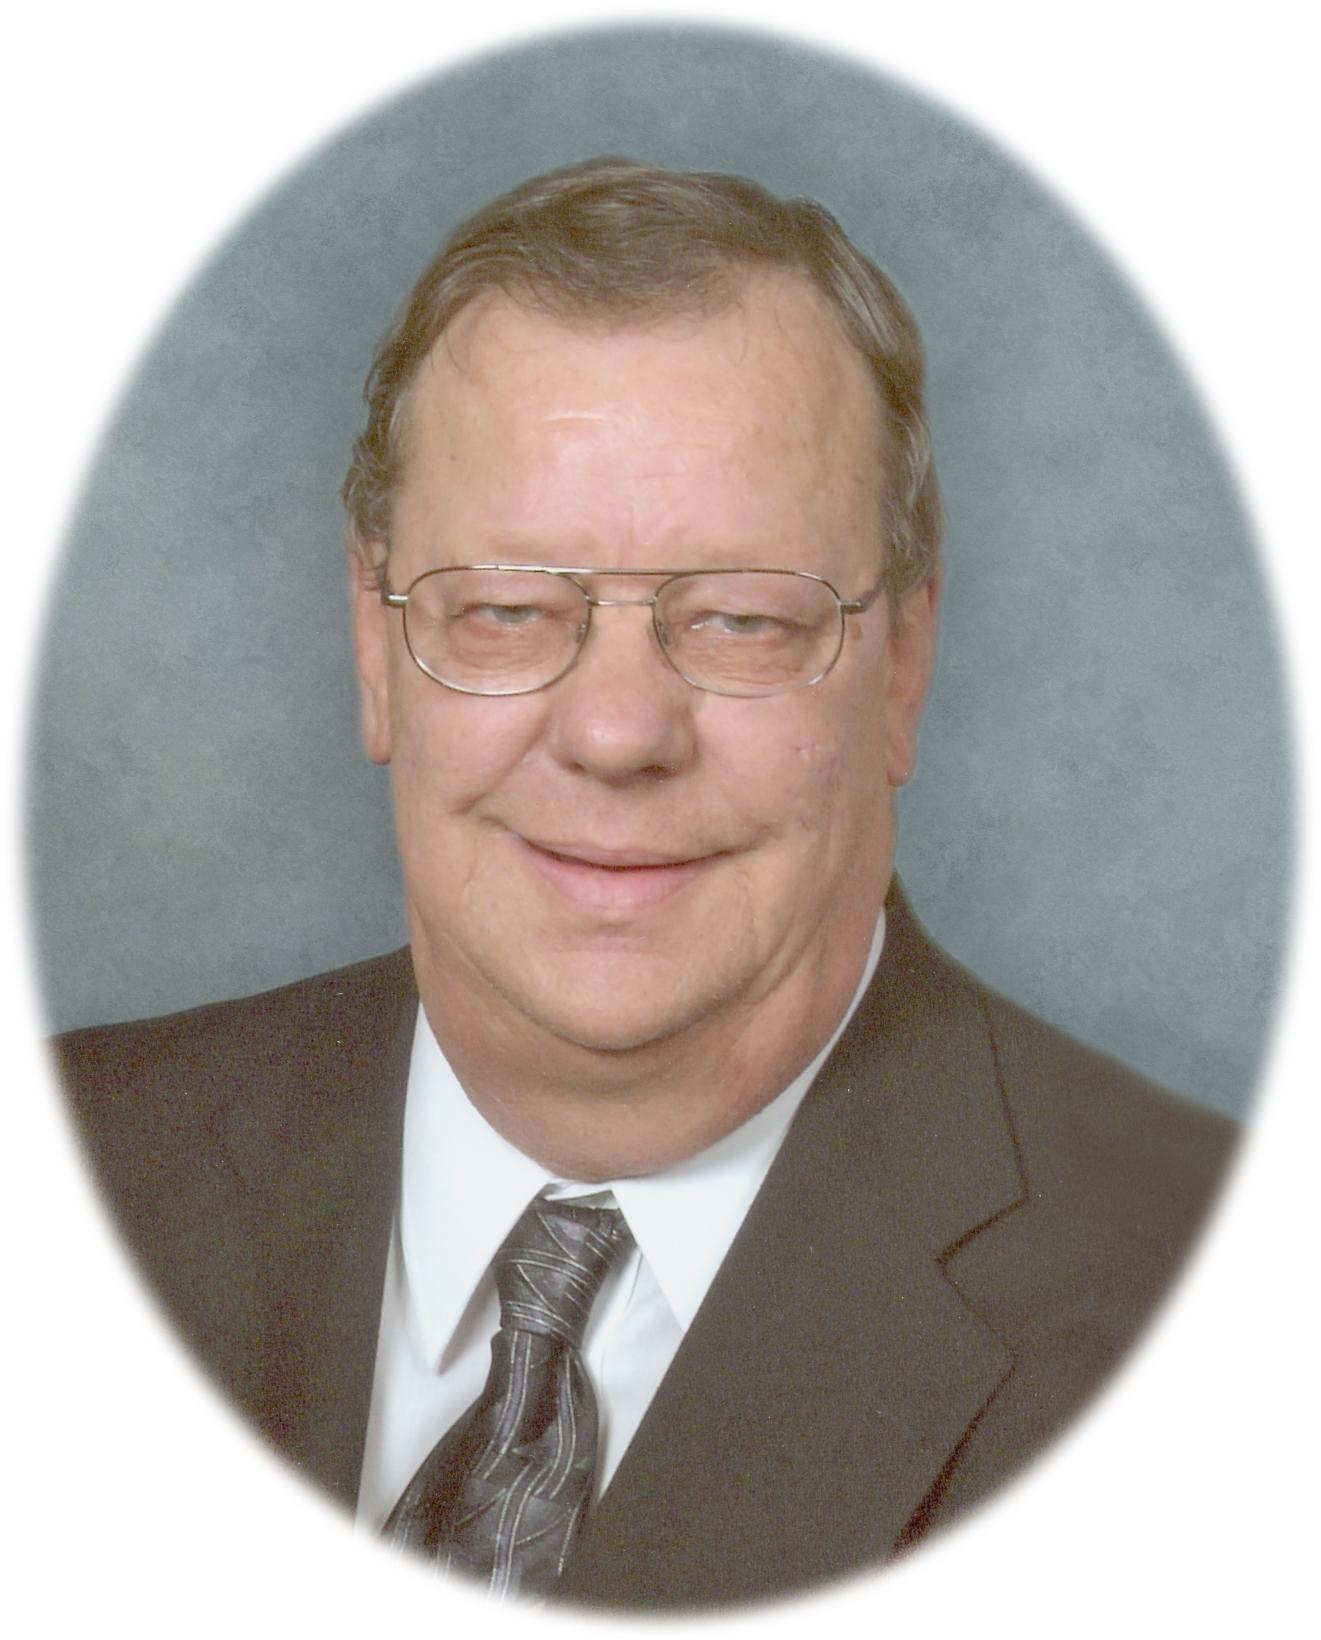 Charles T. Pfeifer